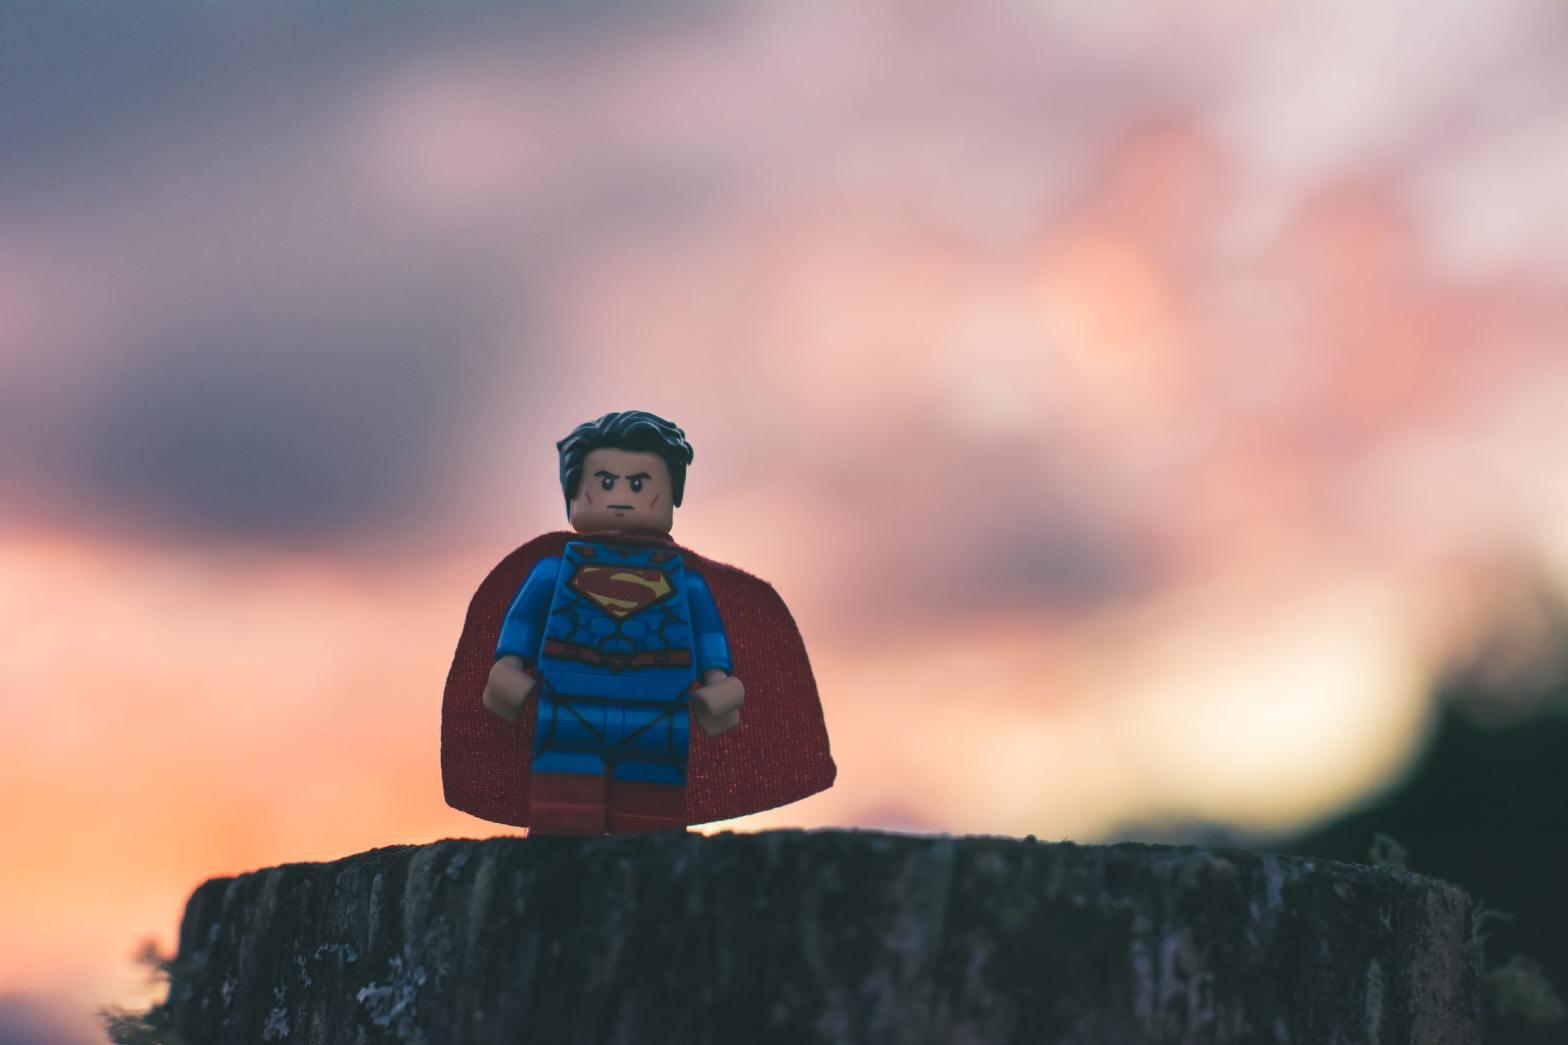 Superman Photo by Esteban Lopez on Unsplash